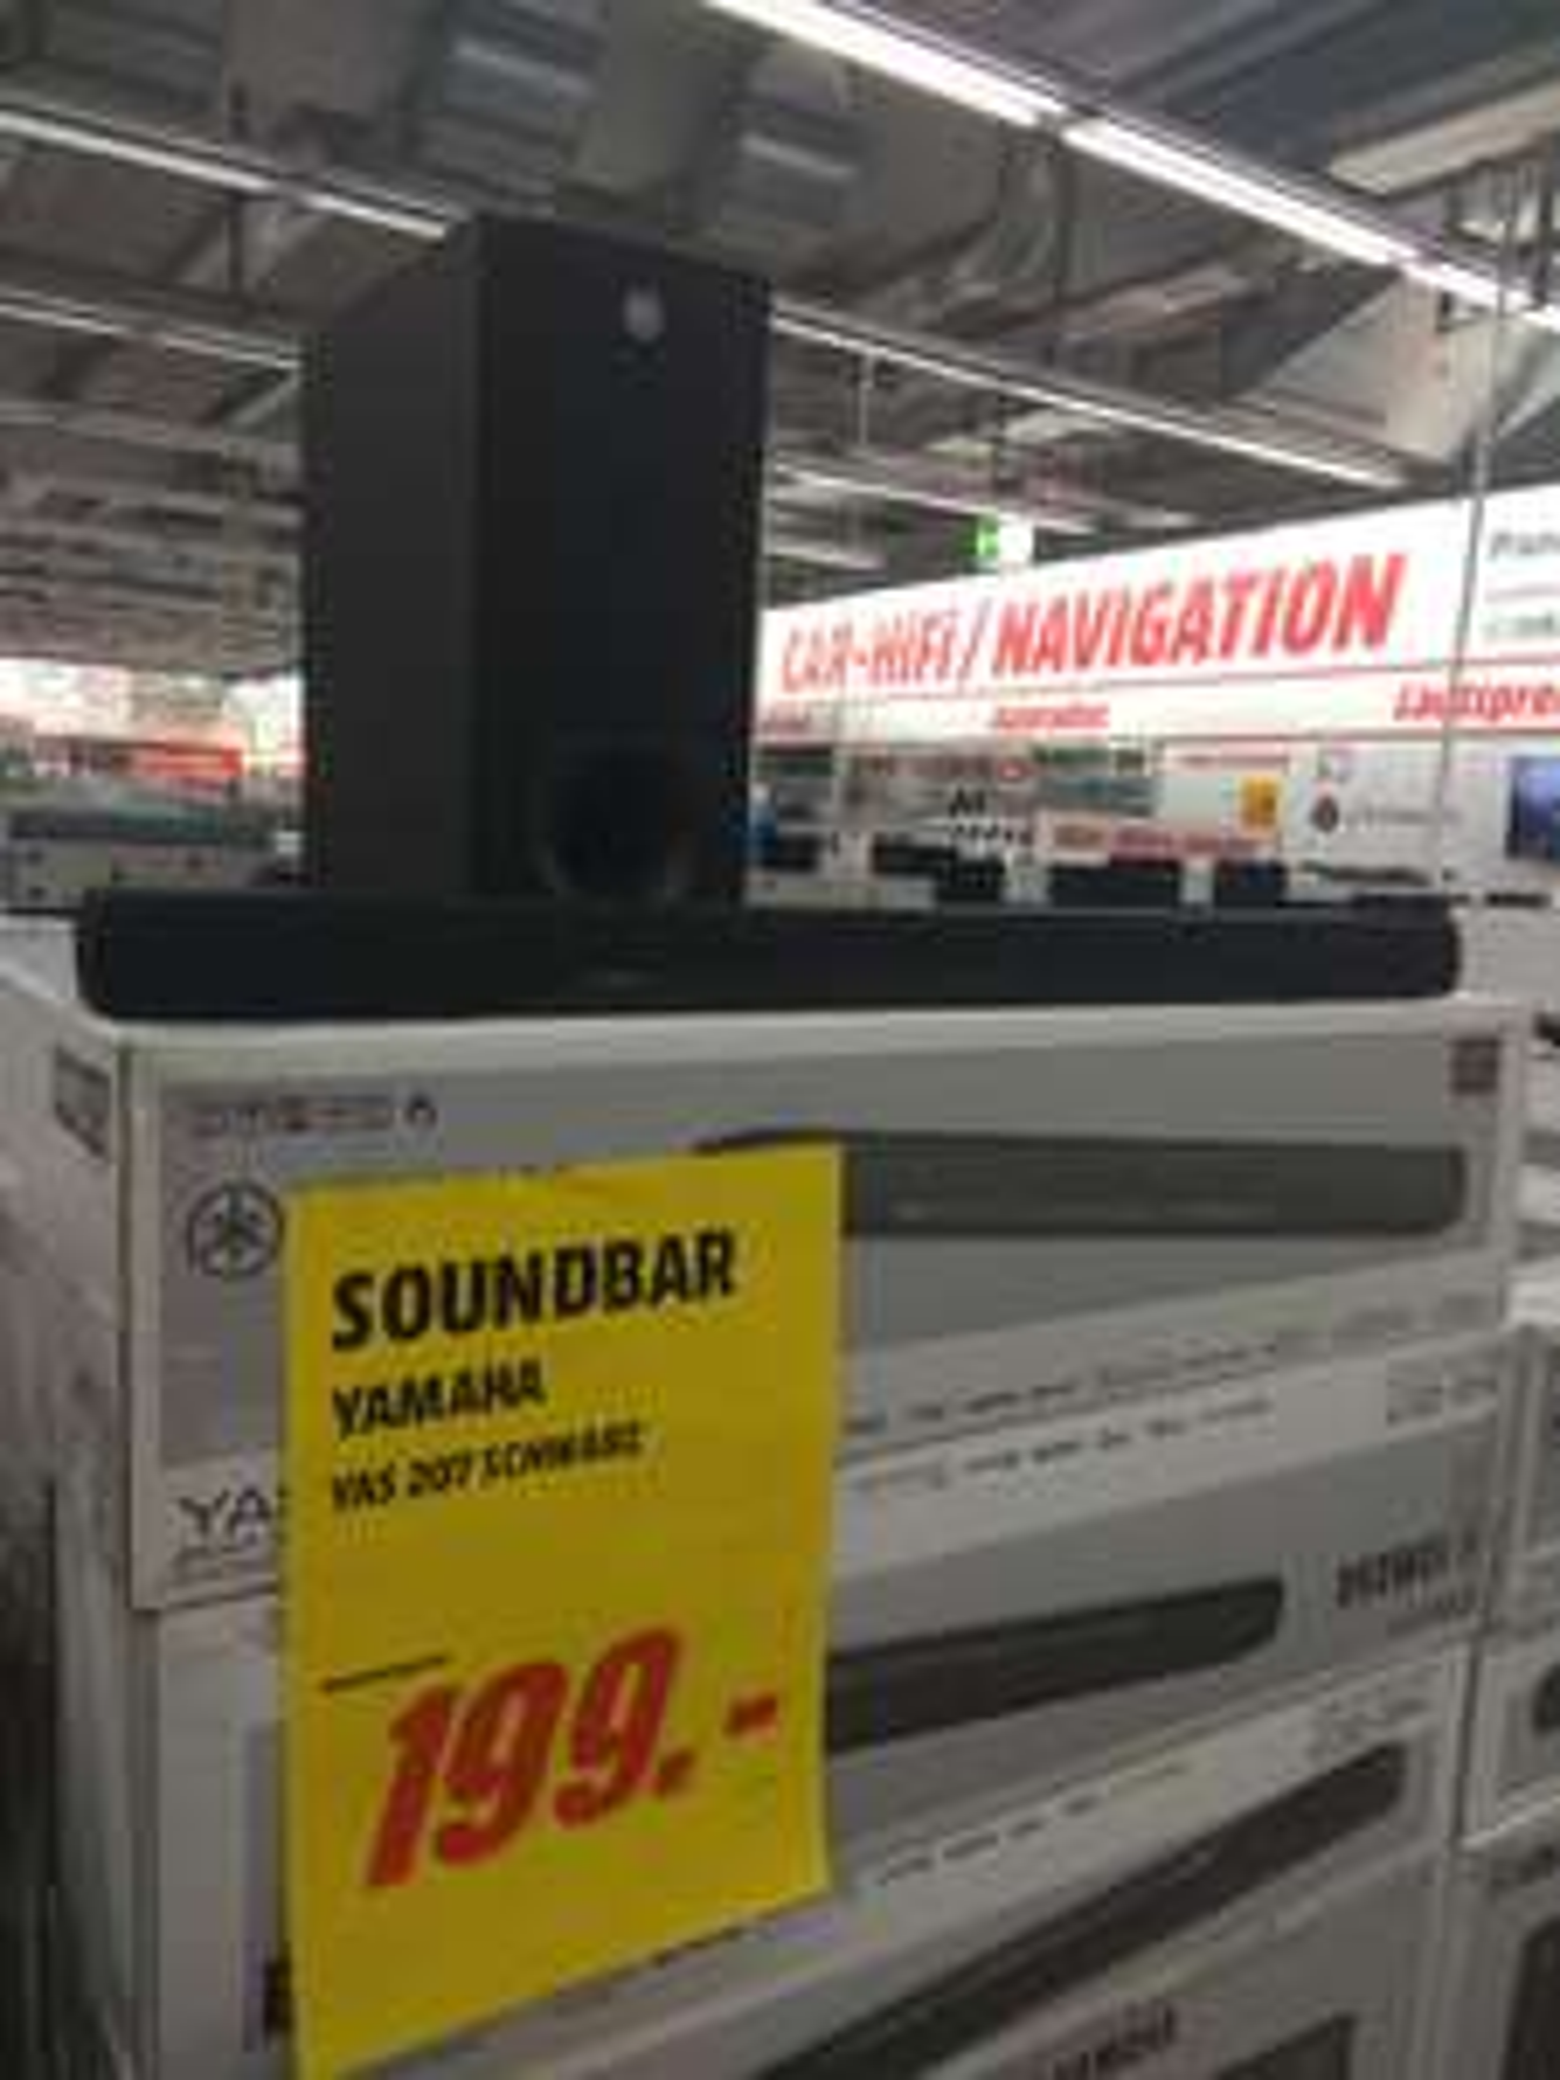 Media Markt Bochum RuhrparkJubiläum Yamaha Yas 207 Soundbar mit Funk Subwoofer